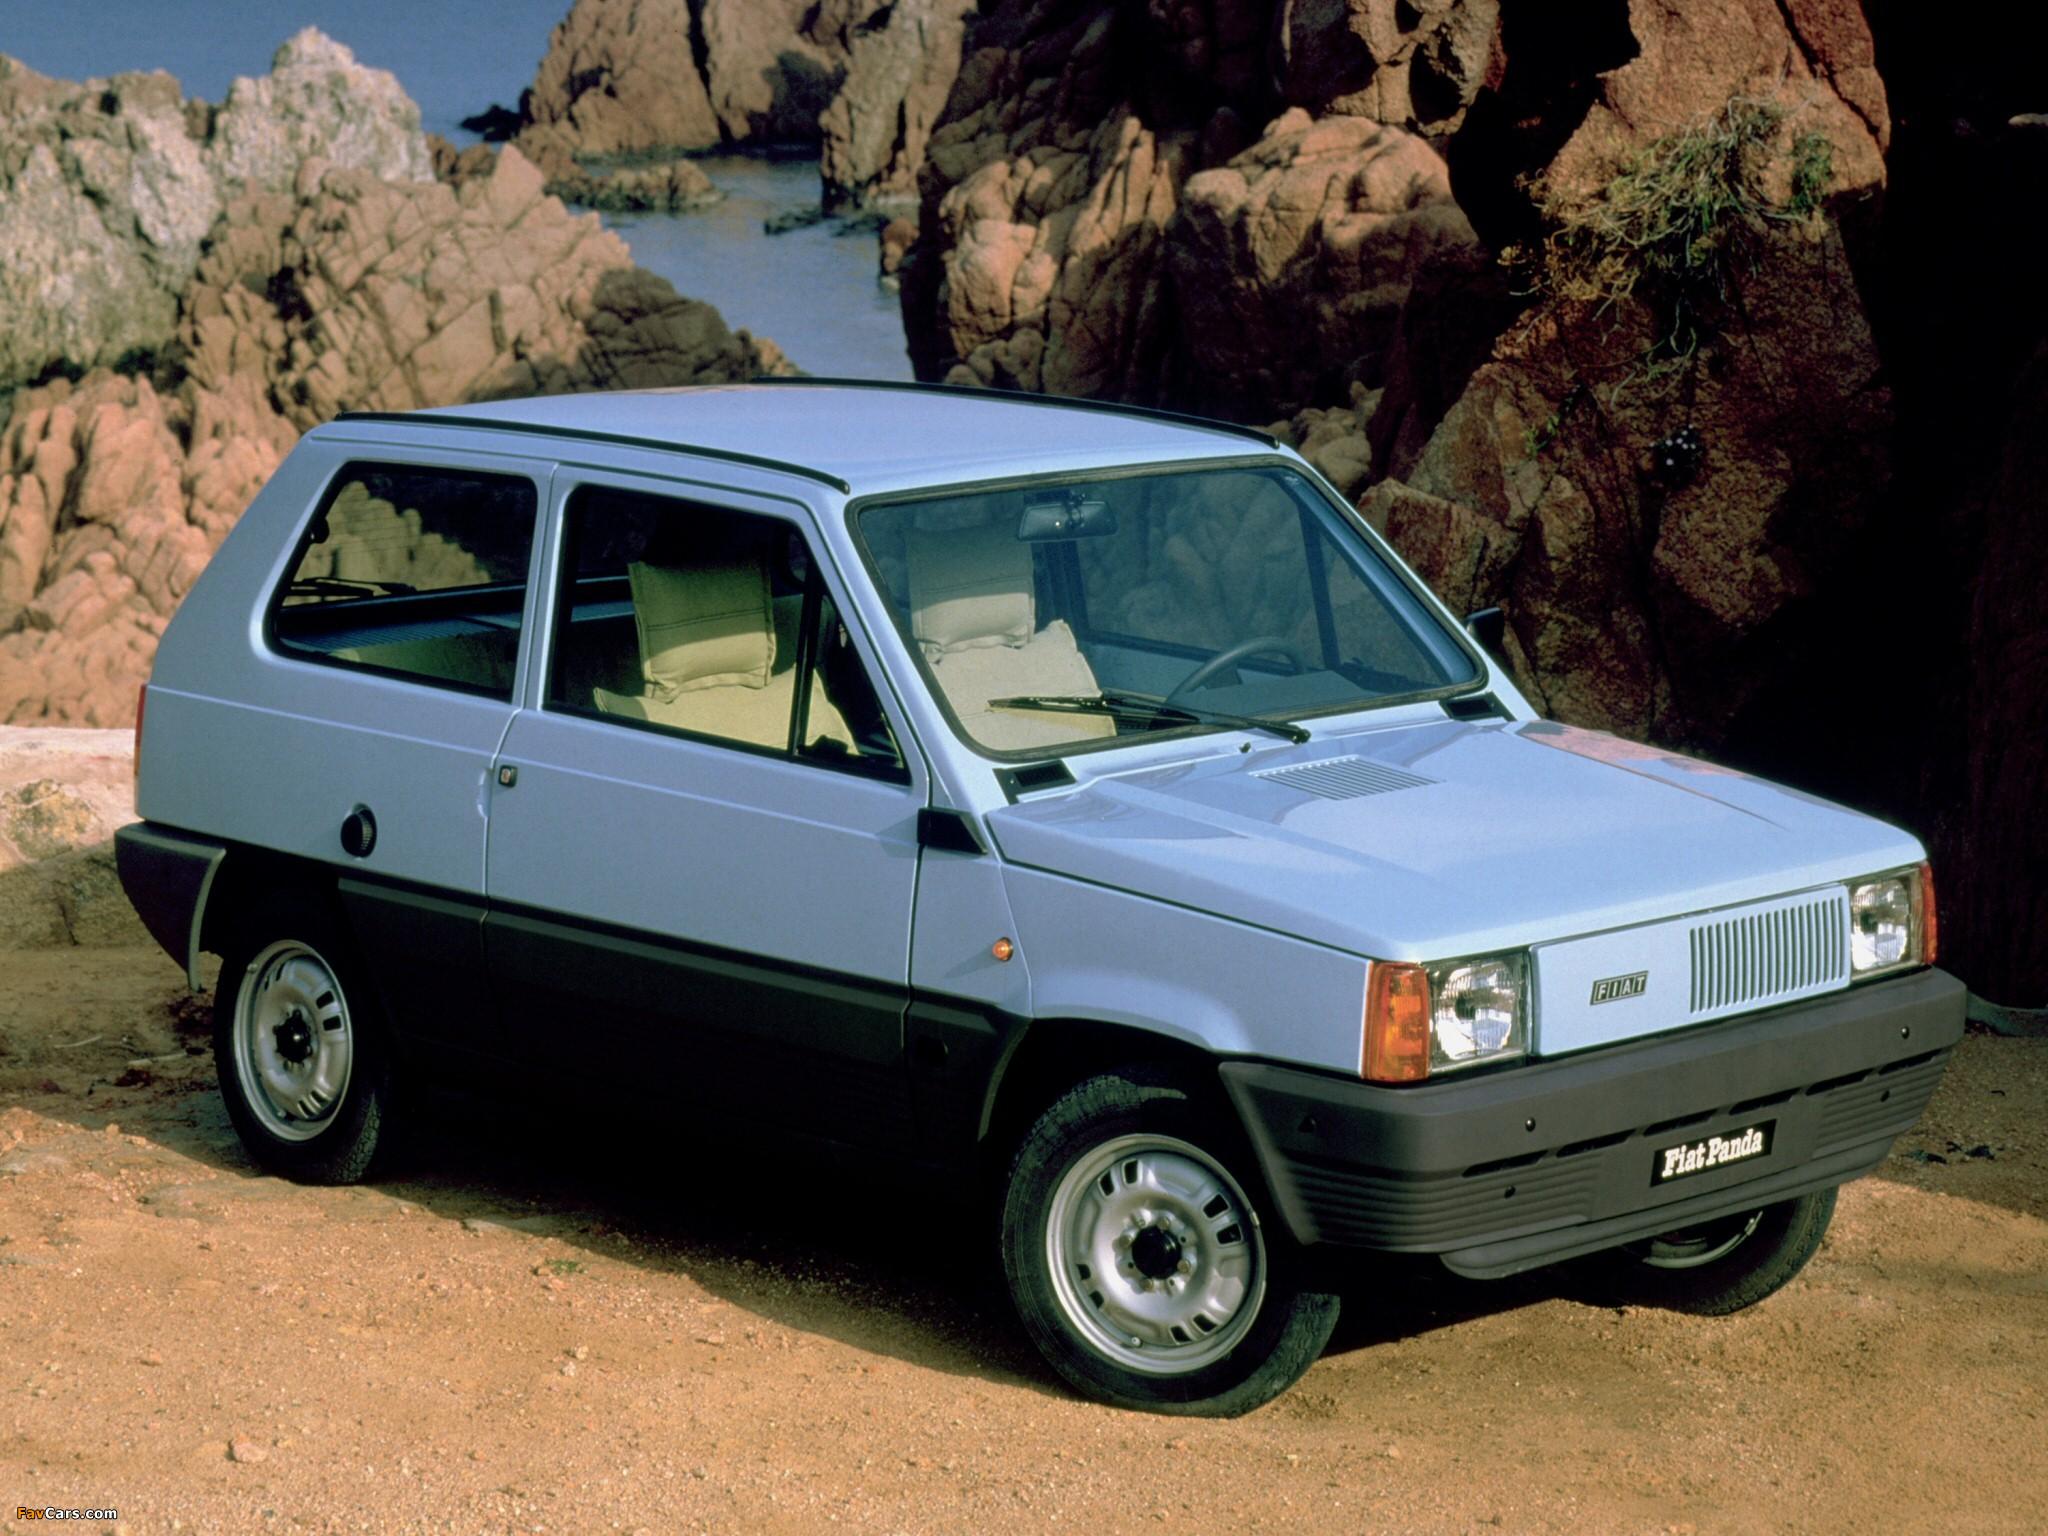 Fiat Panda 45 141 198084 wallpapers 2048x1536